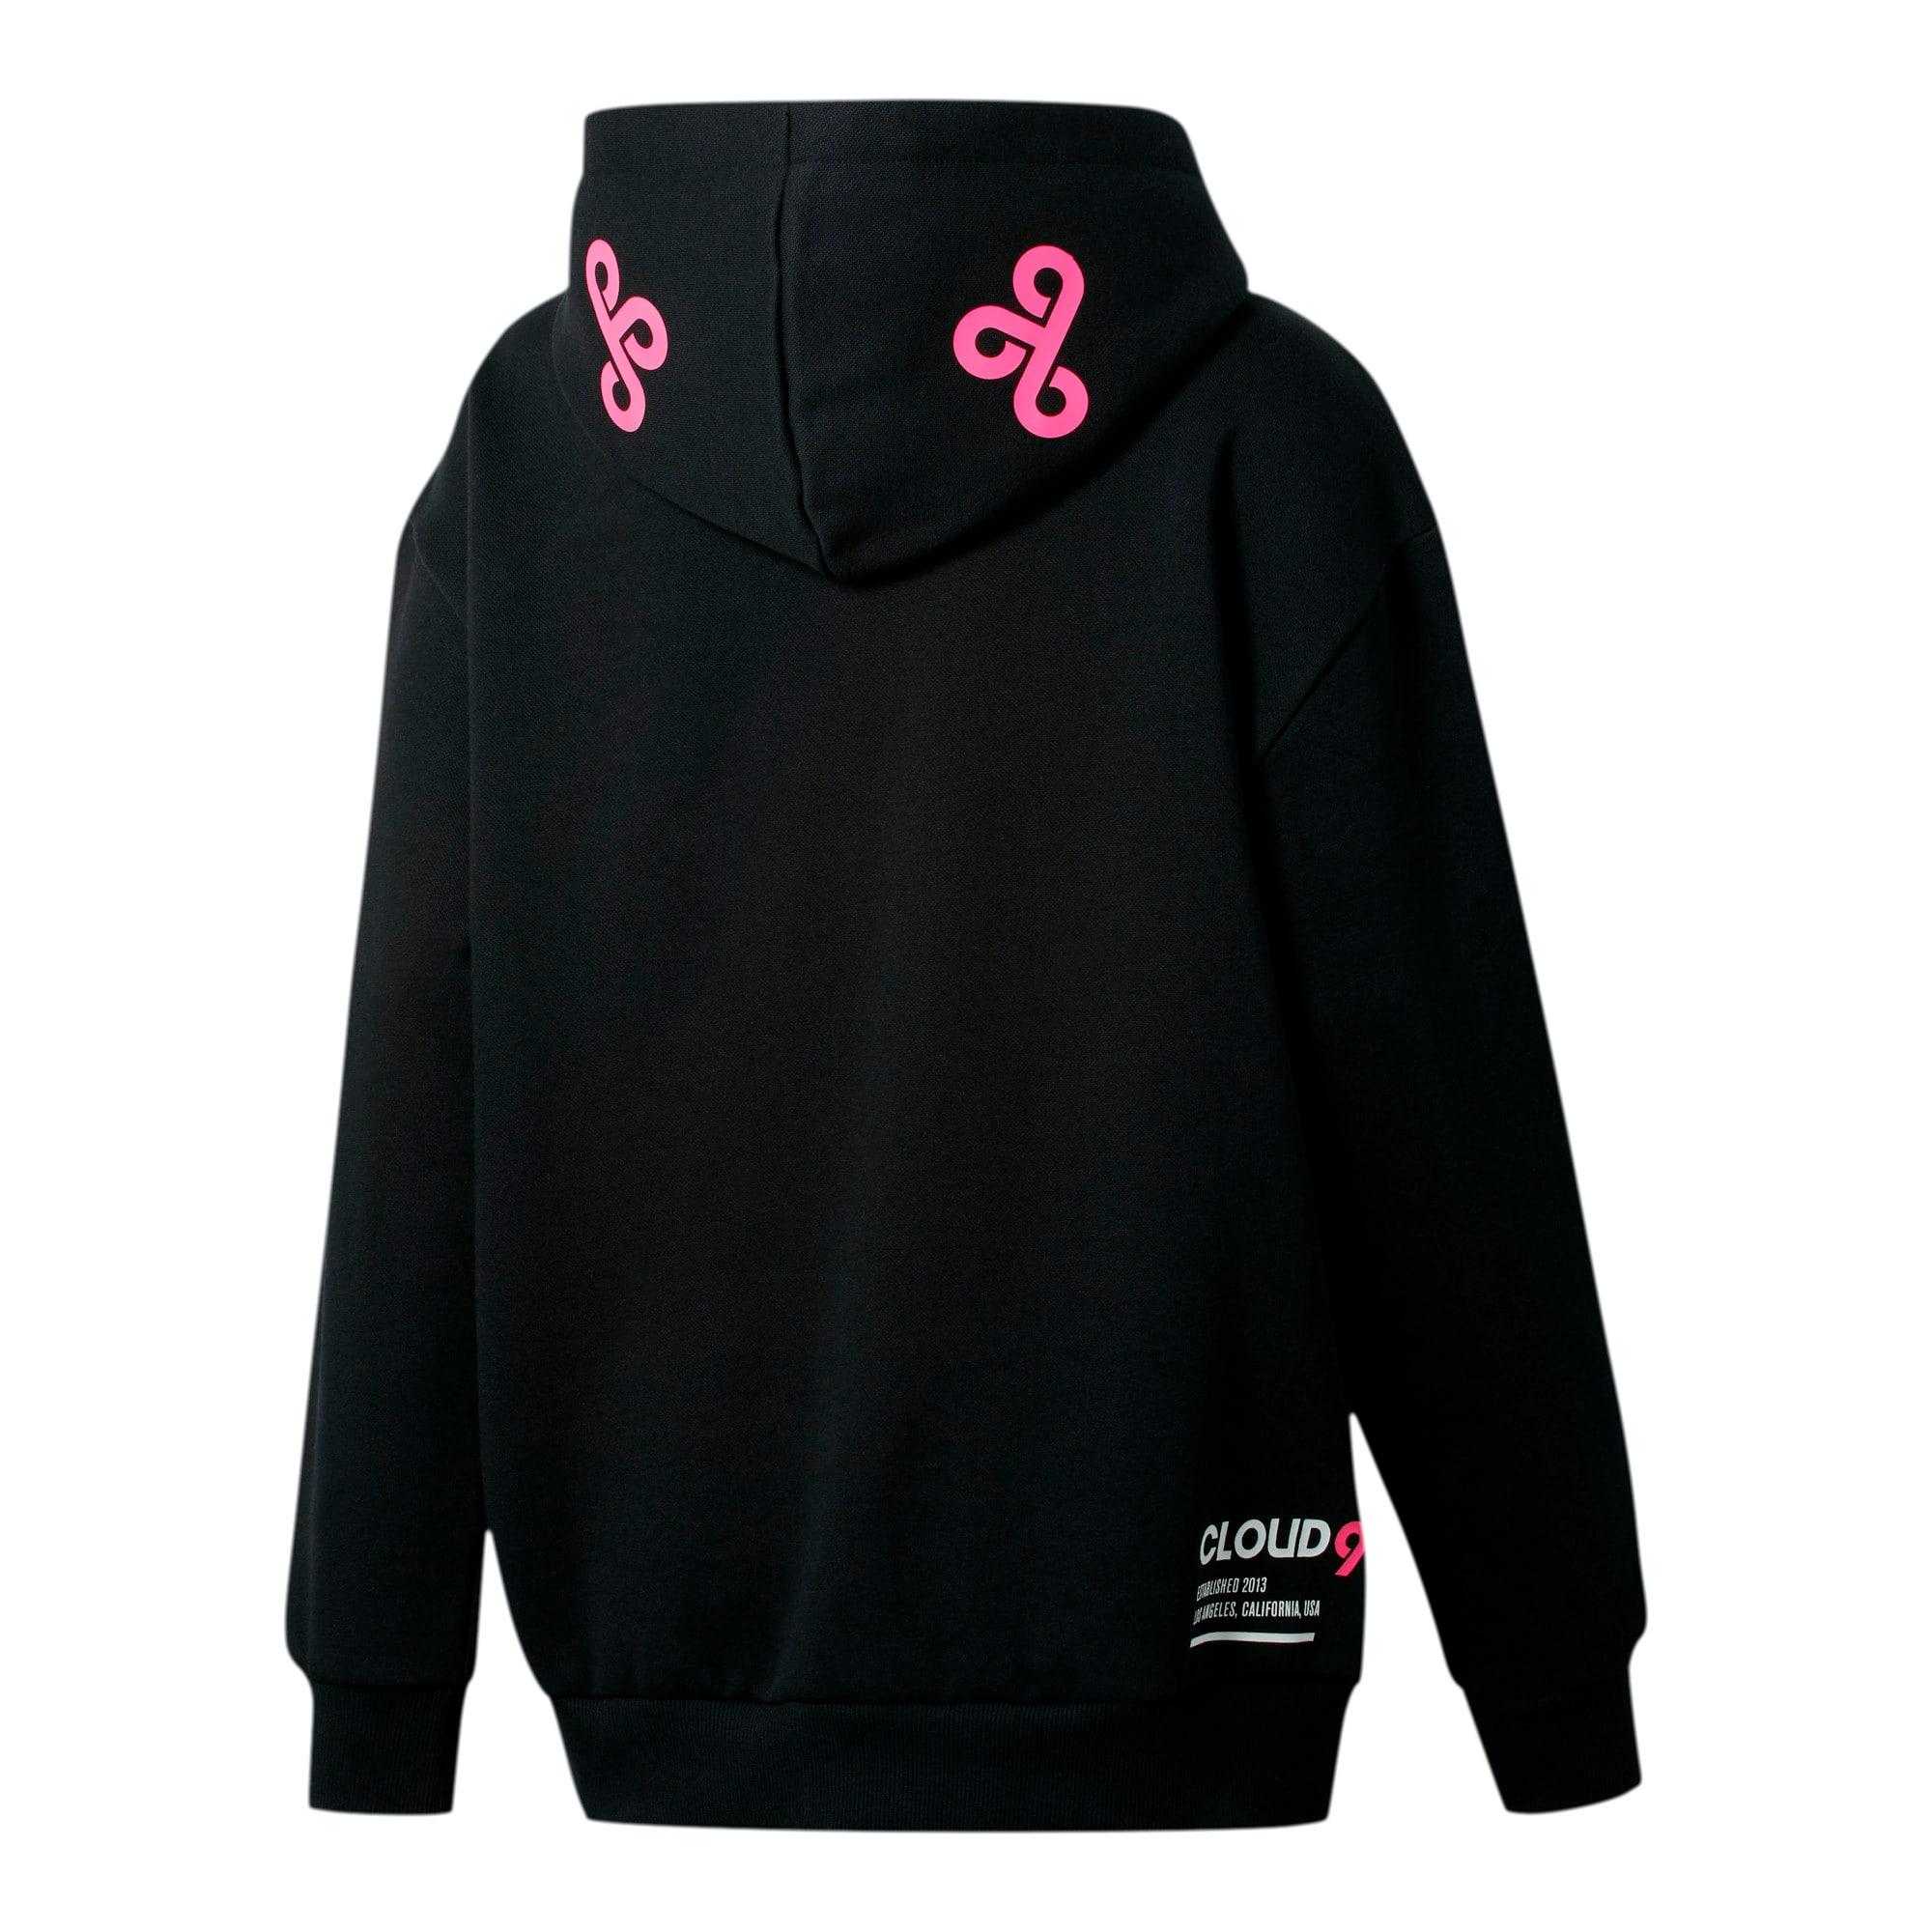 Miniatura 2 de Sudadera con capucha PUMA x CLOUD9 Simulation para mujer, Cotton Black-Azalea Pink, mediano